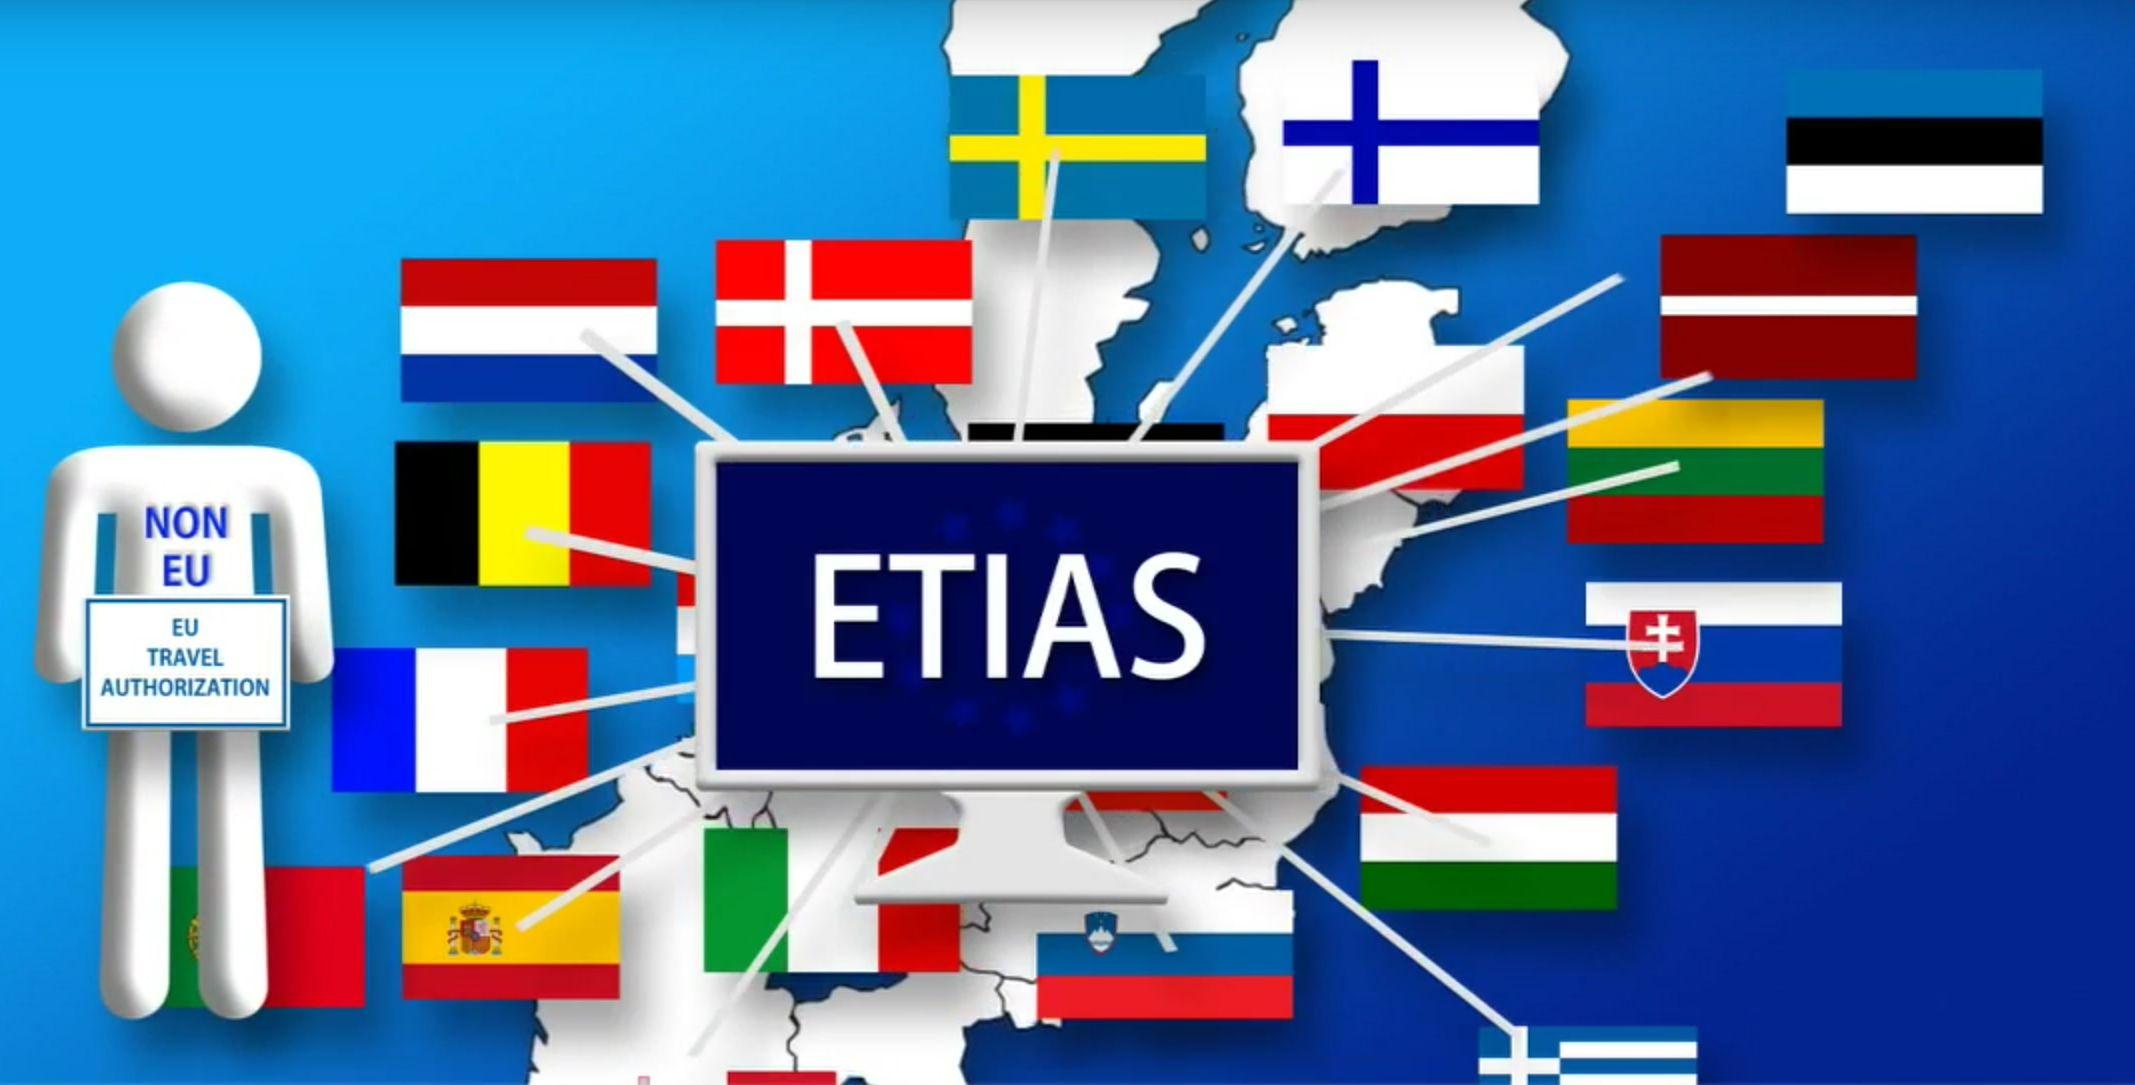 Etias Advanced Checks And Travel Authorization Fee For Non Eu